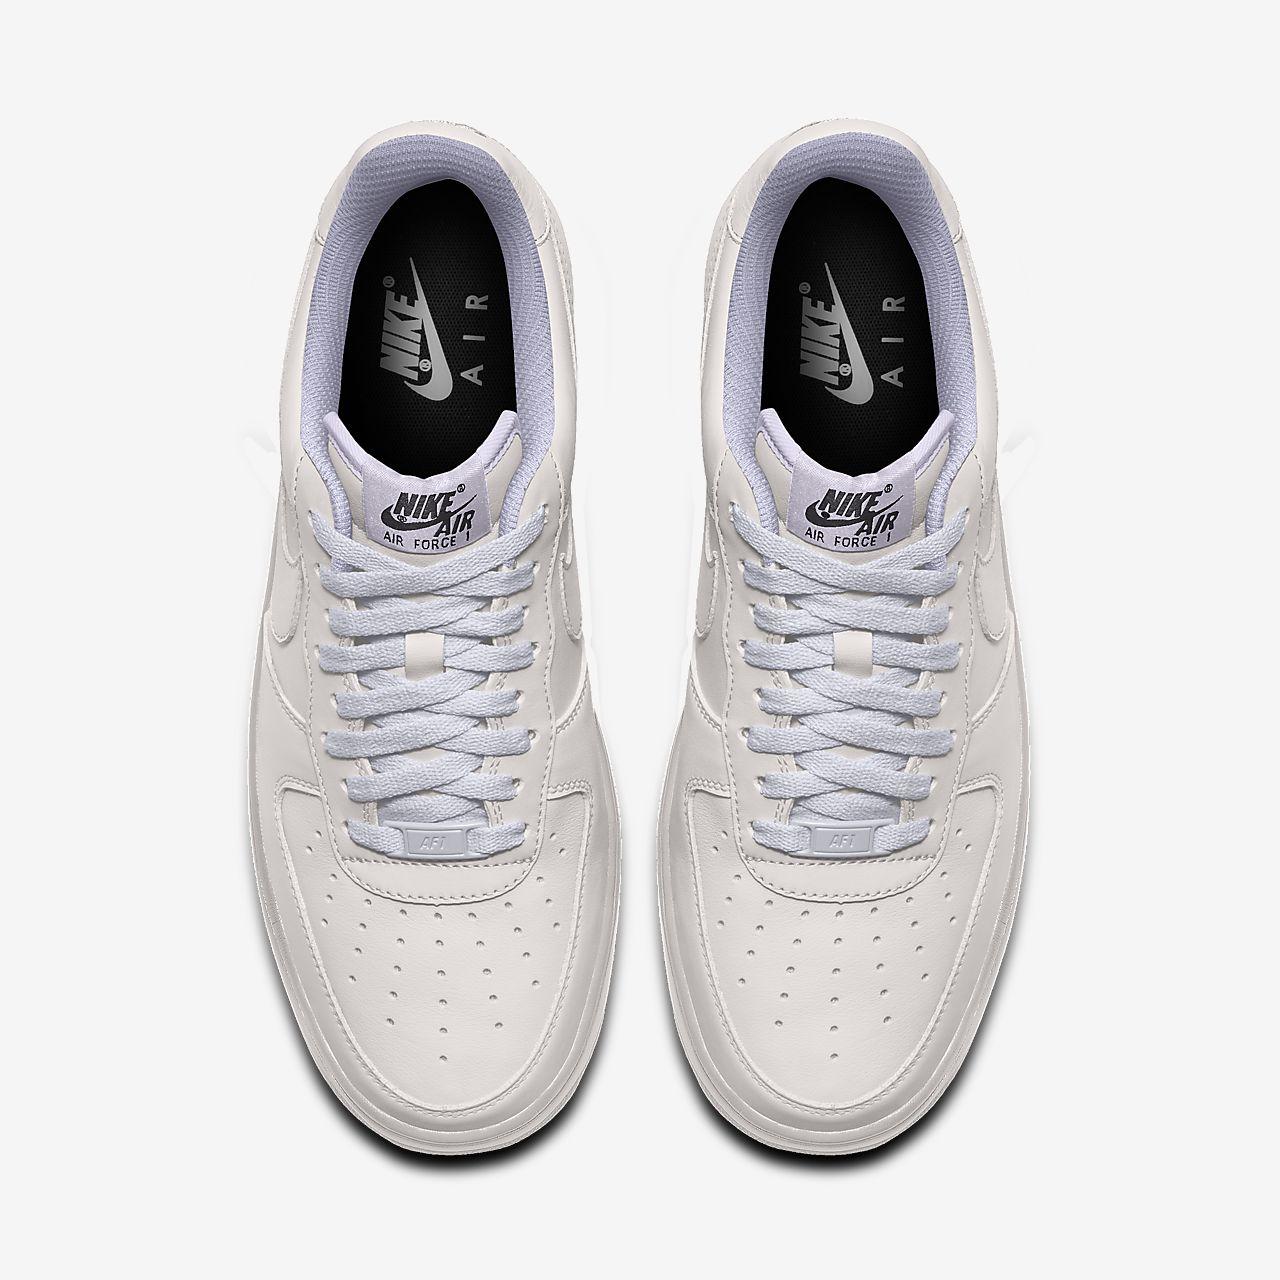 Custom Nike Air Force 1 Migos   Nike shoes air force